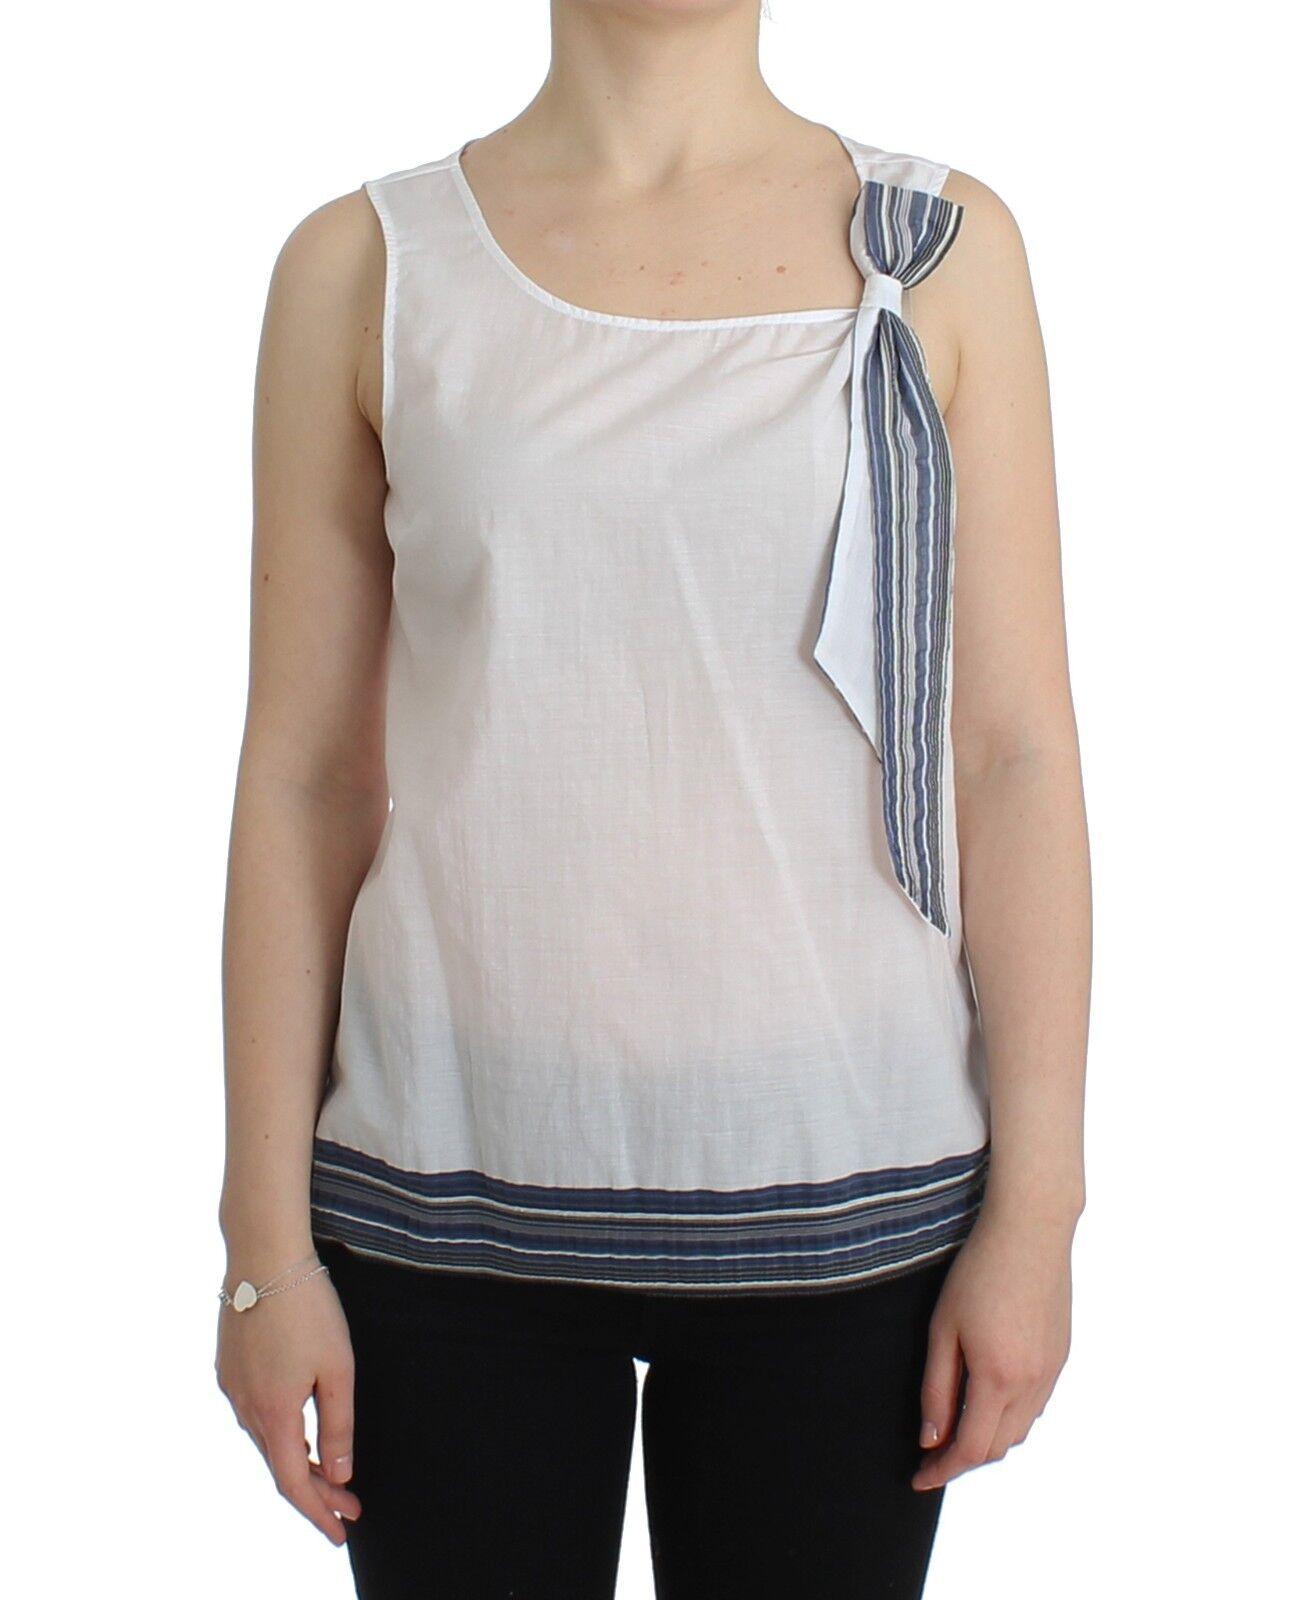 NWT Ermanno Scervino Weiß Blau Top Blouse Tank Shirt Sleeveless IT44 US10